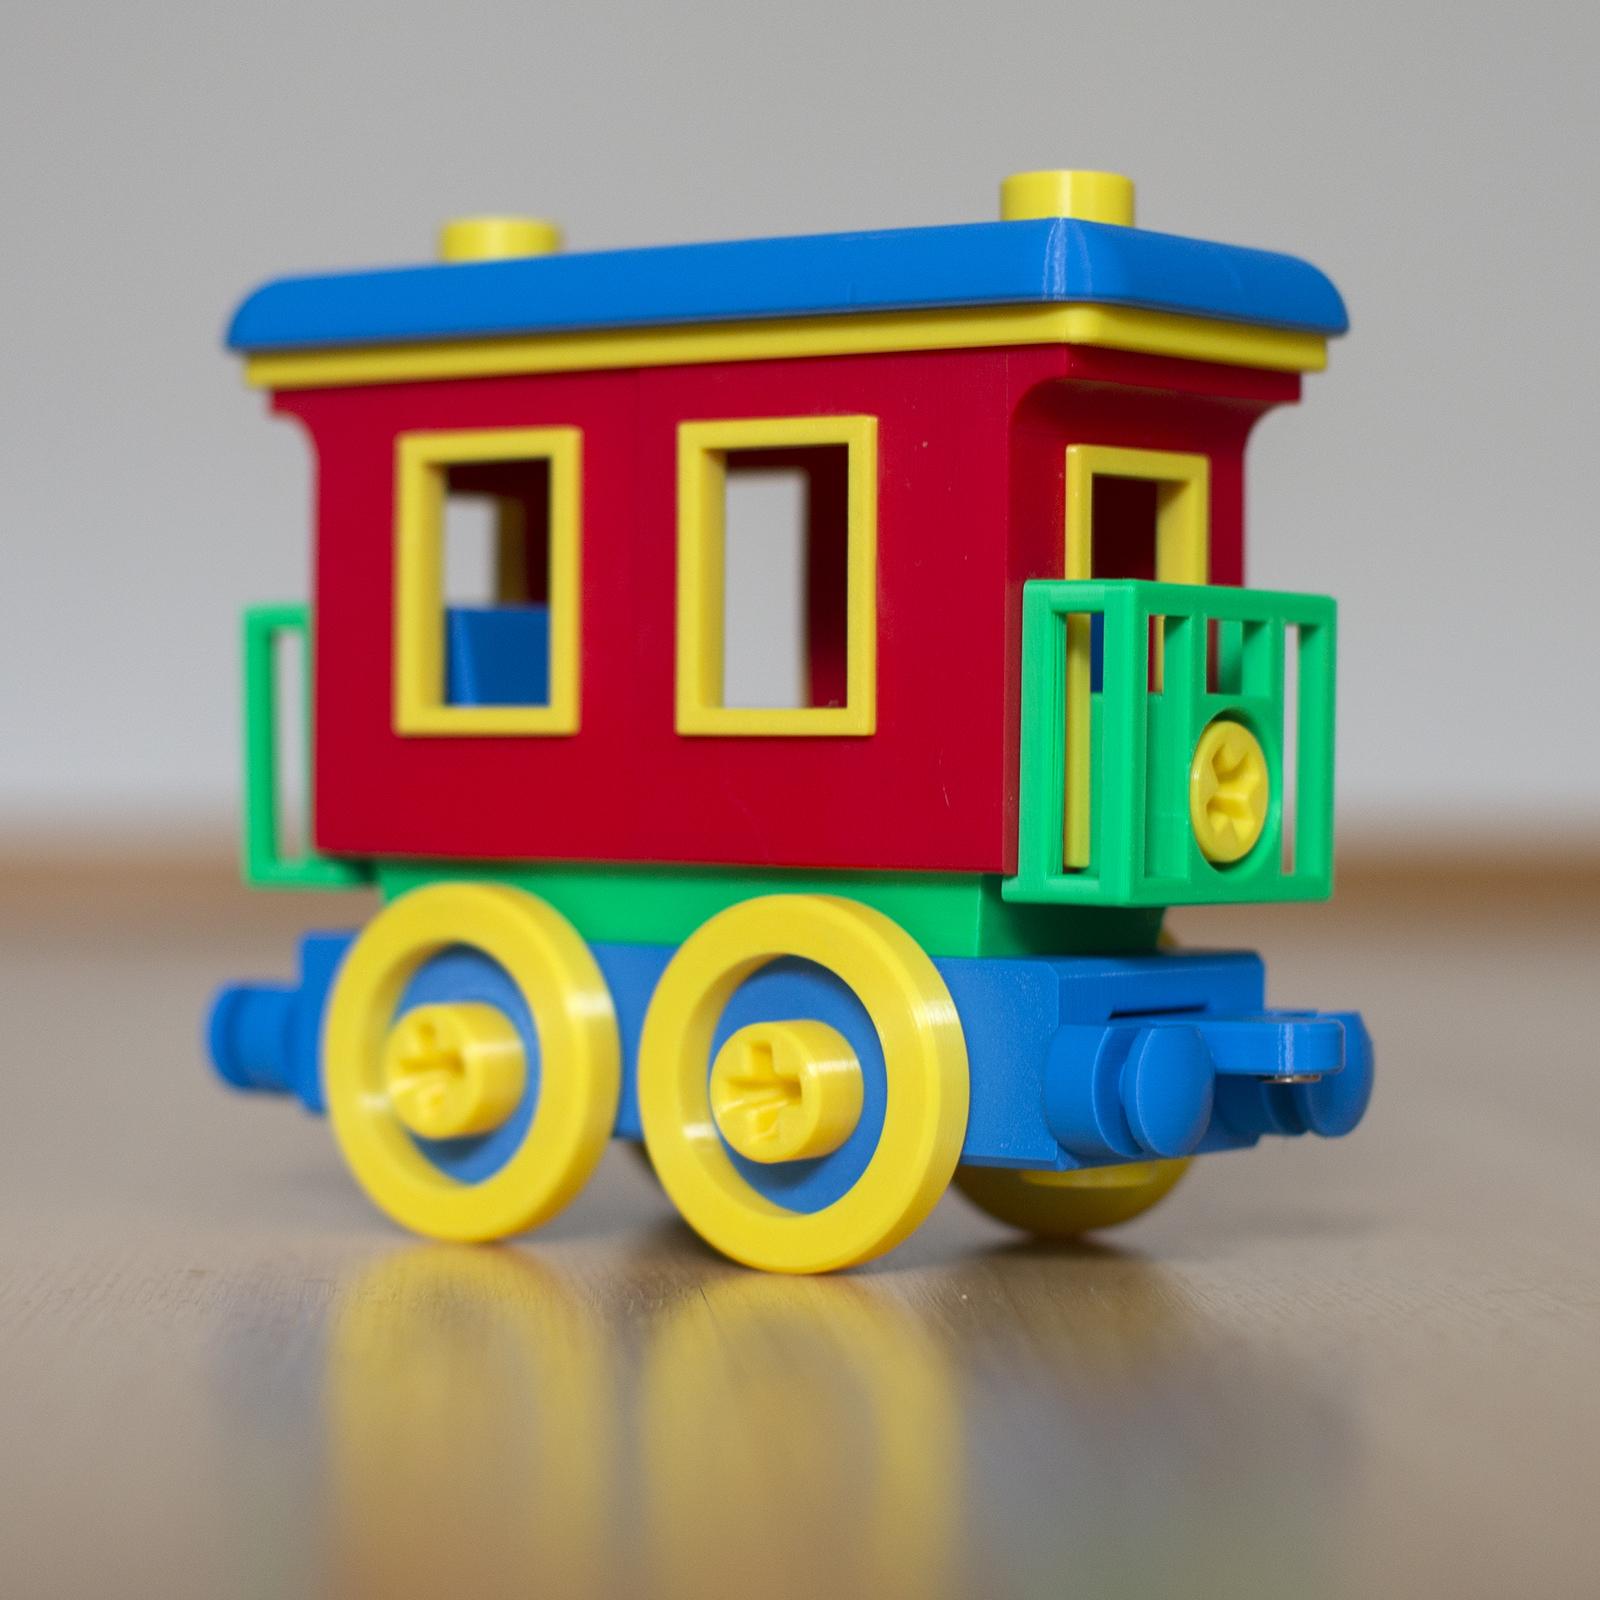 passenger.jpg Download STL file Toy train construction set - whole train combo • 3D print object, kozakm